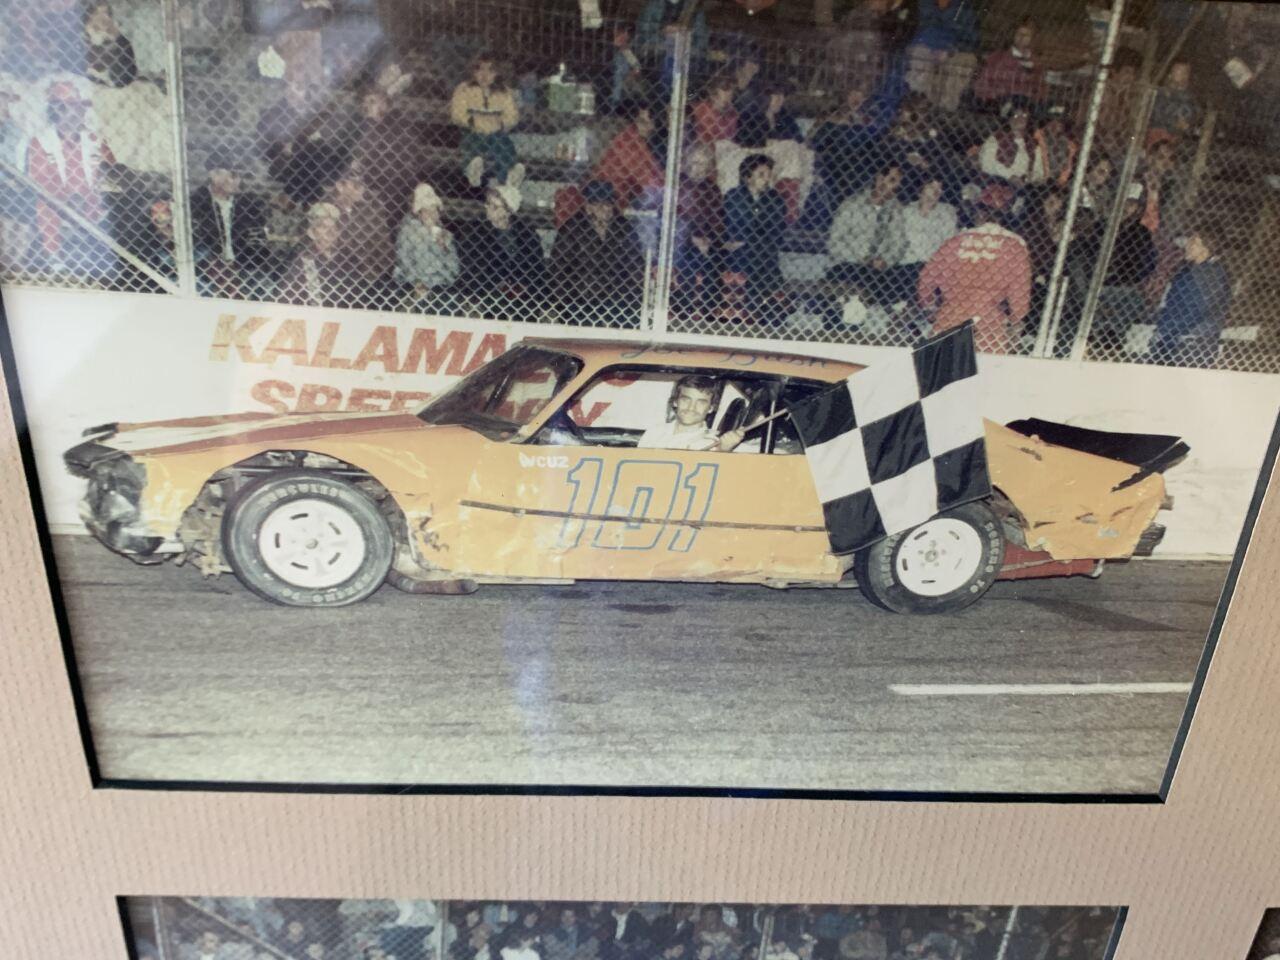 Joe Bush in his first race car